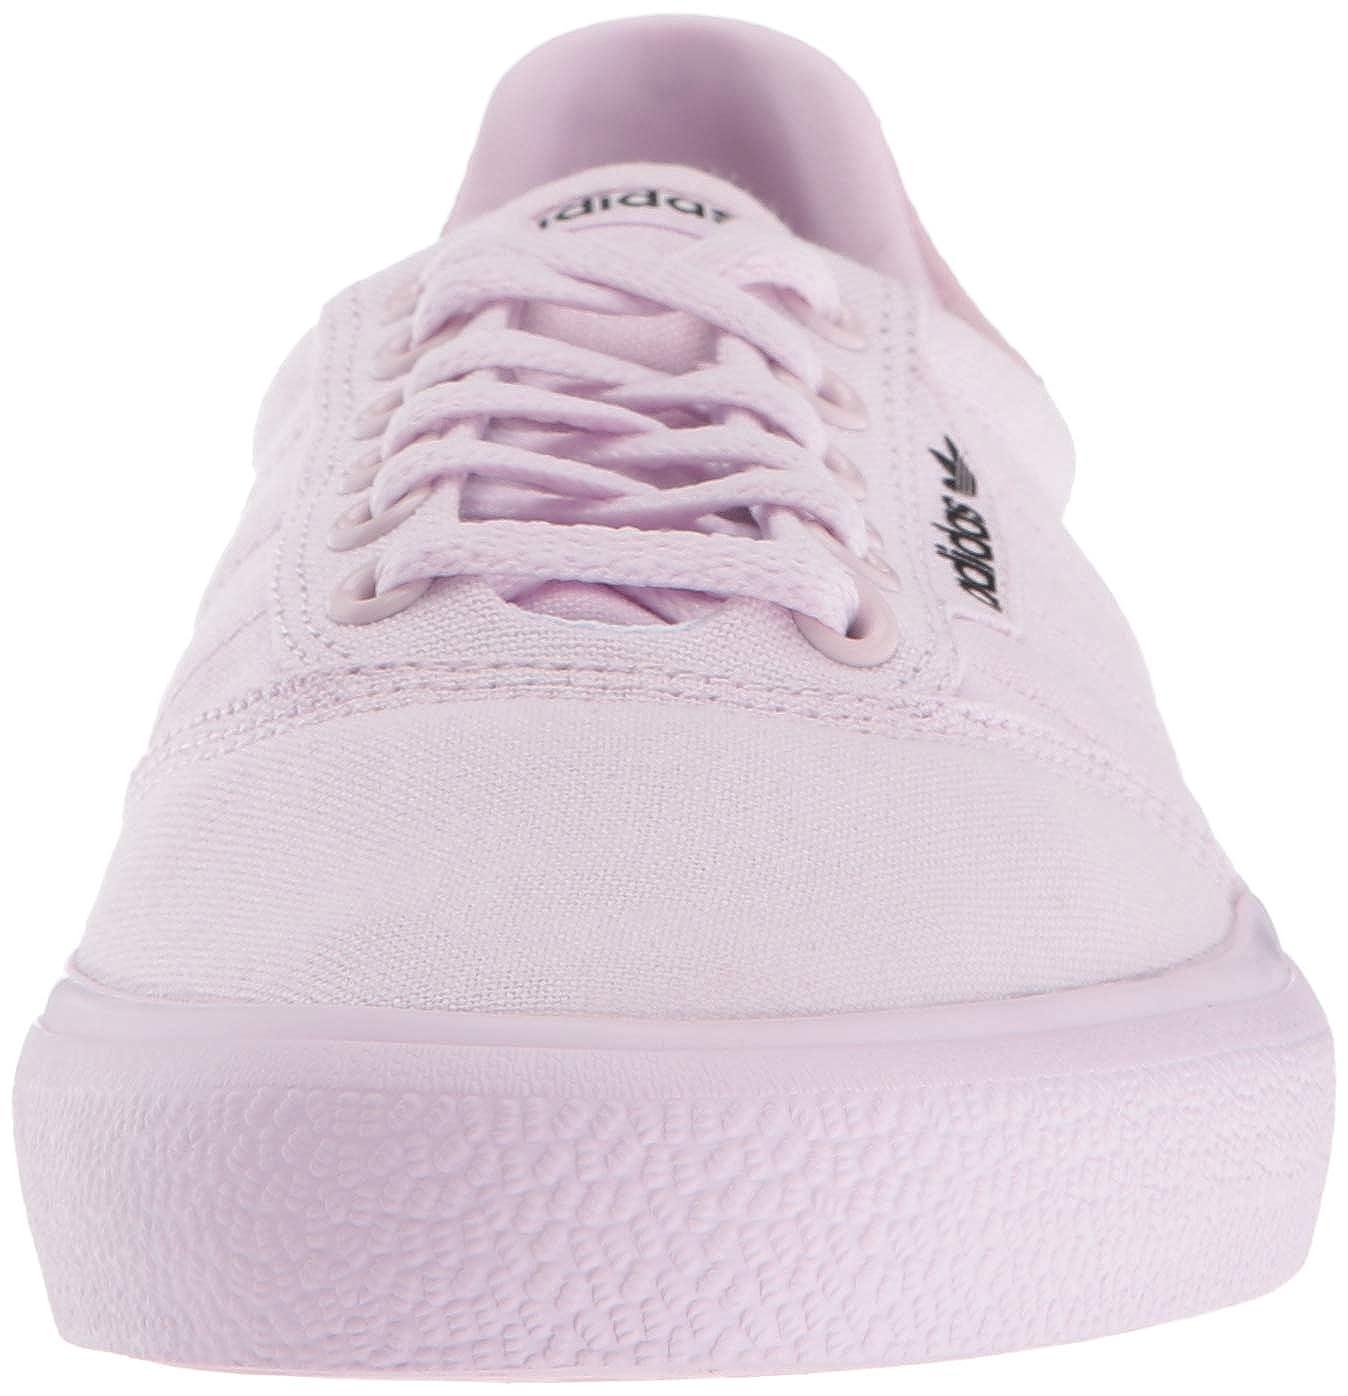 new products 5f268 c3d8e Amazon.com  adidas 3mc  Skateboarding